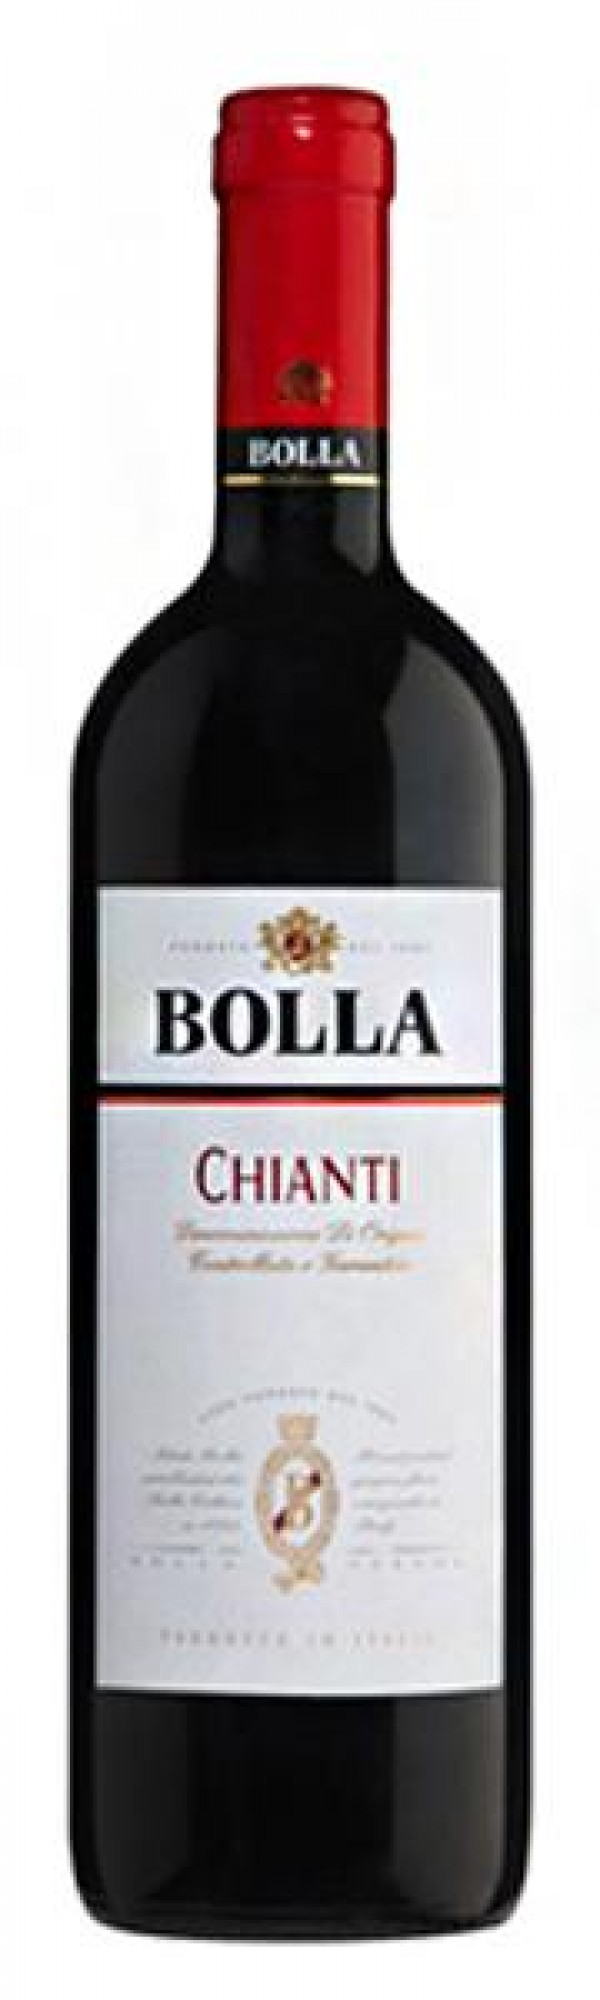 Bolla Chianti